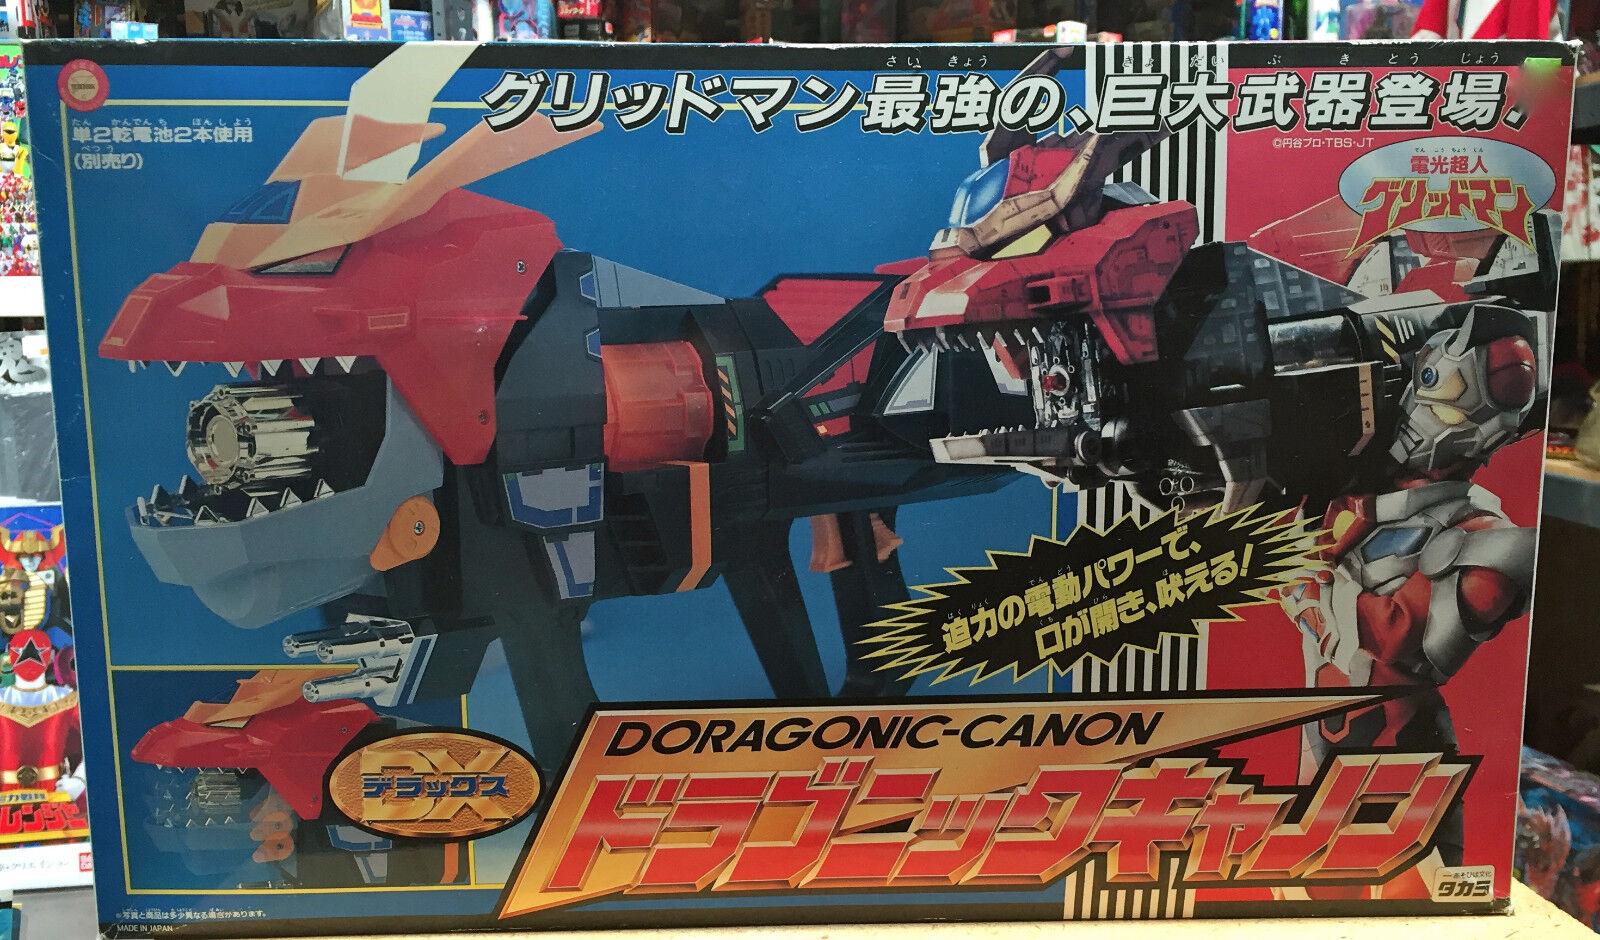 Gridman Dx Doragonic Canon Takara Batteriebetrieben Super Herrench Samurai Syber